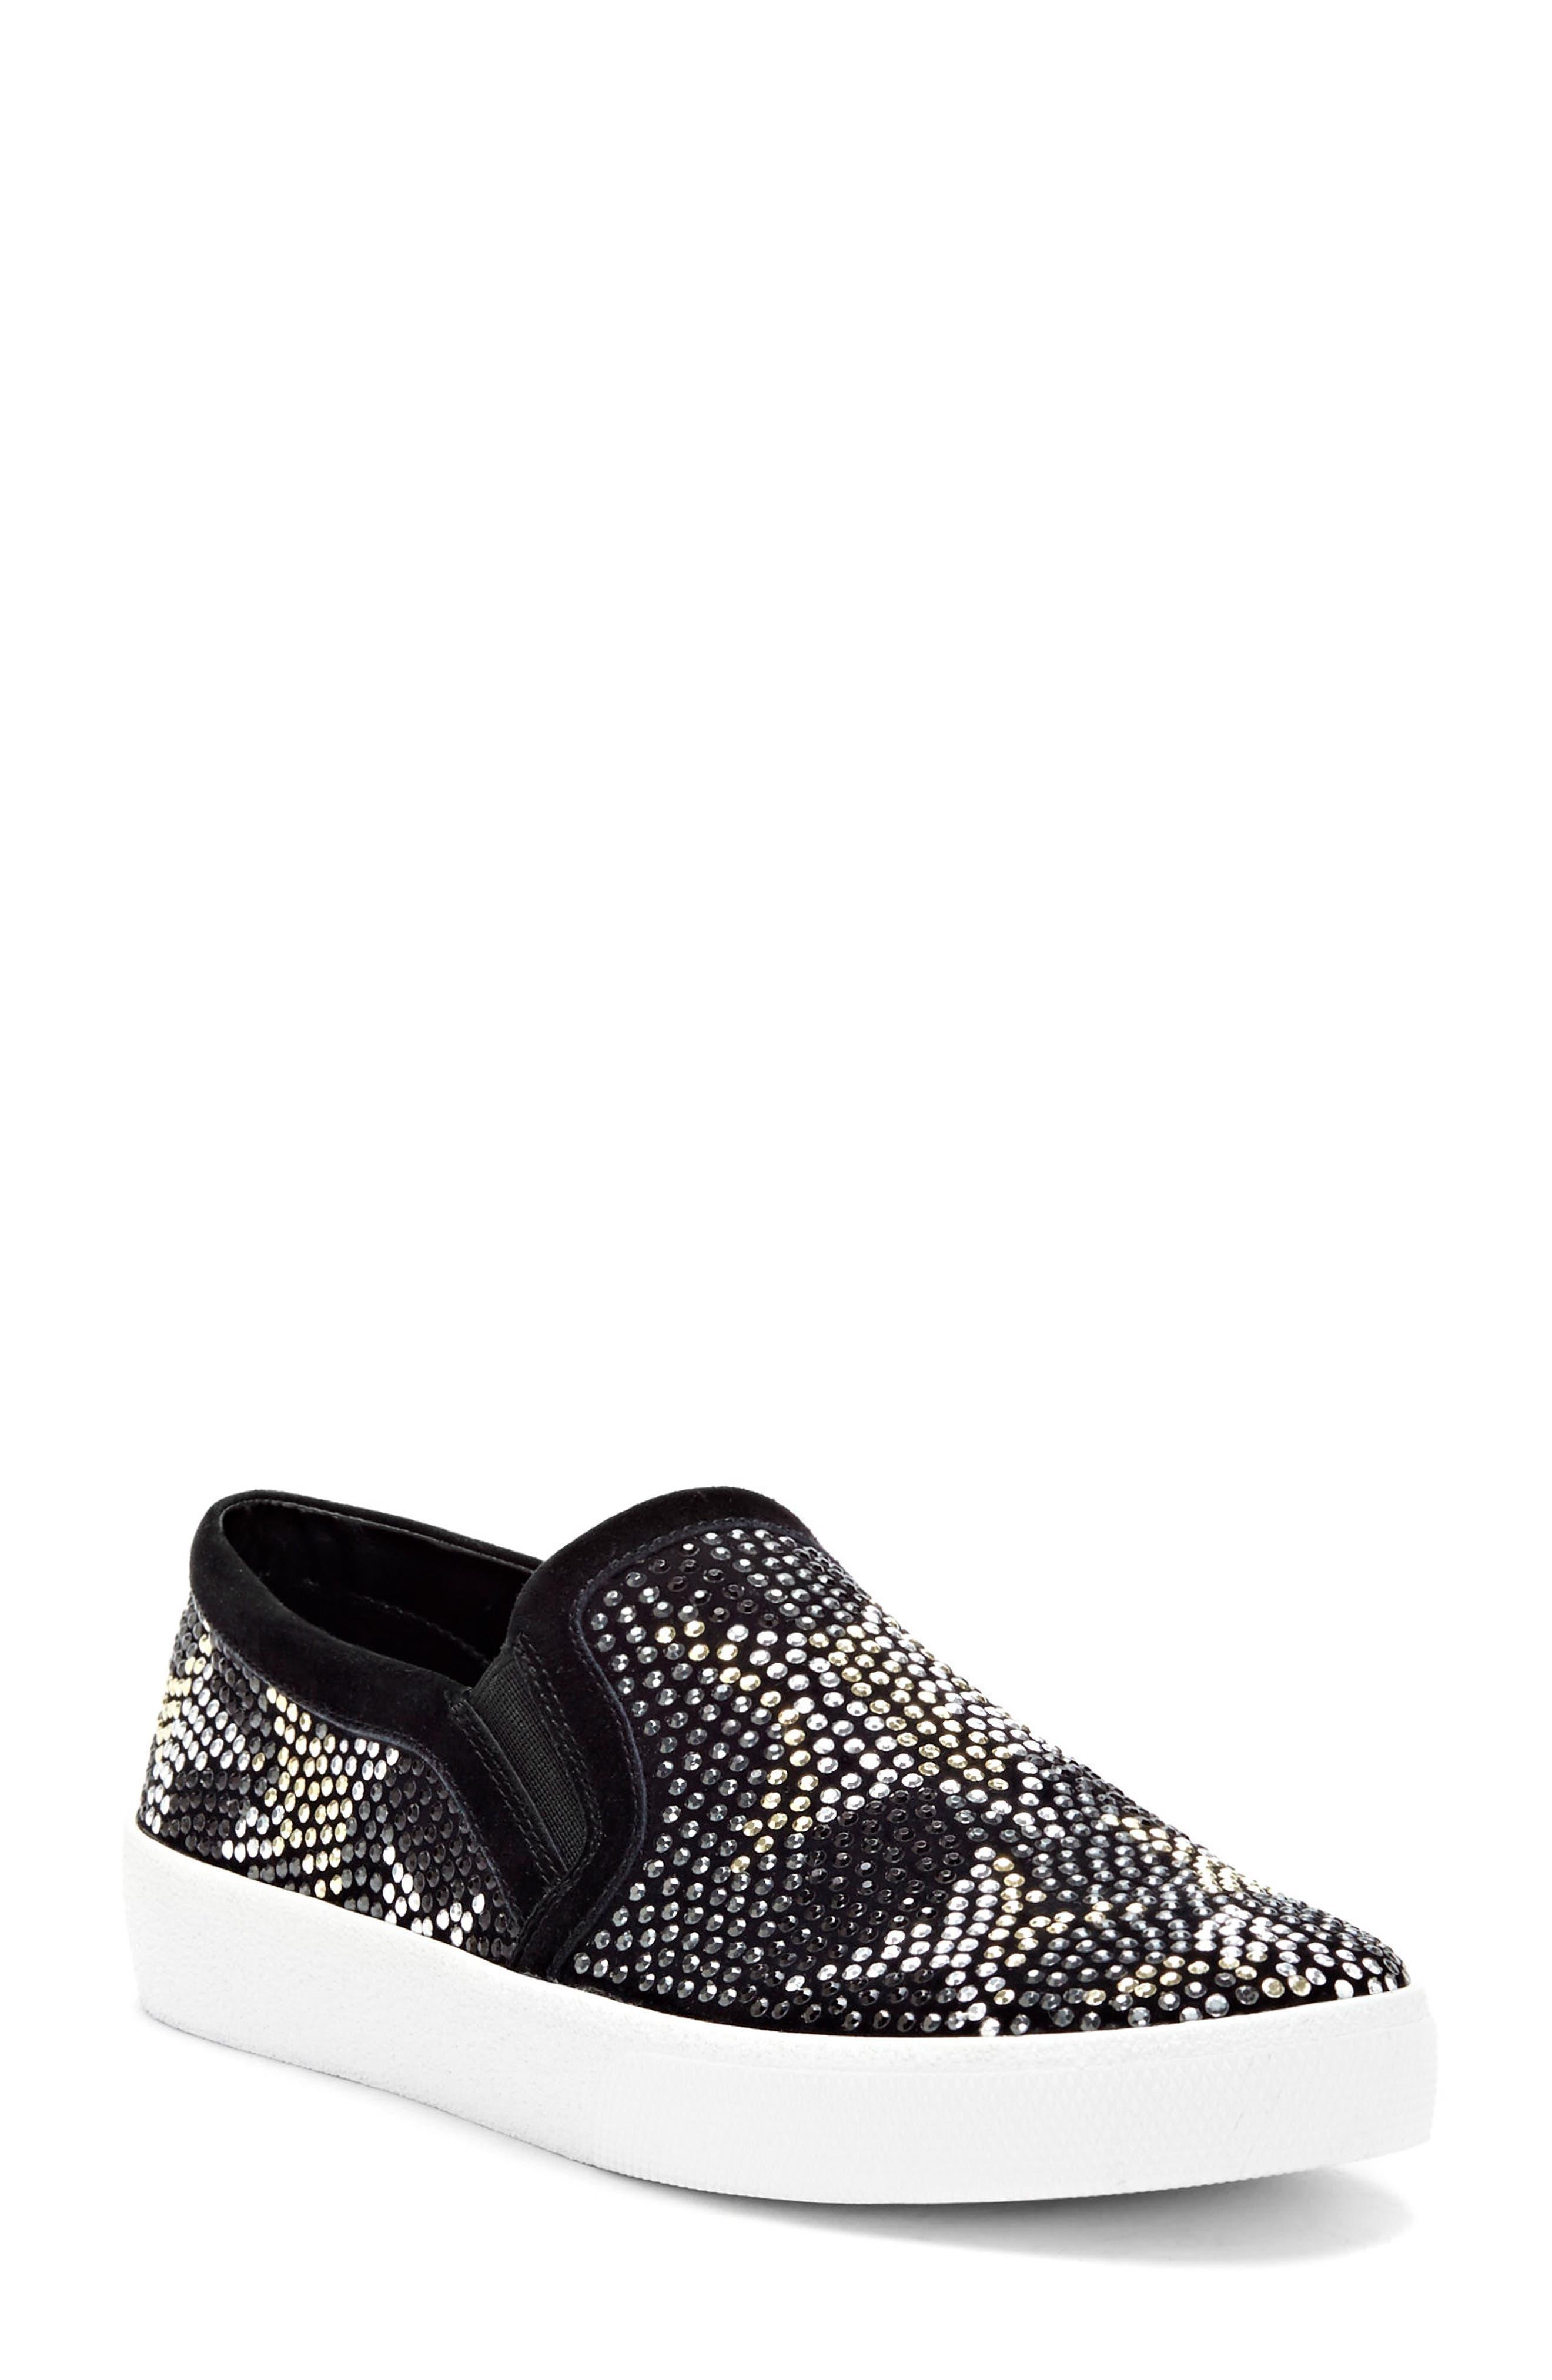 Vince Camuto Canita Slip-On Sneaker (Women)